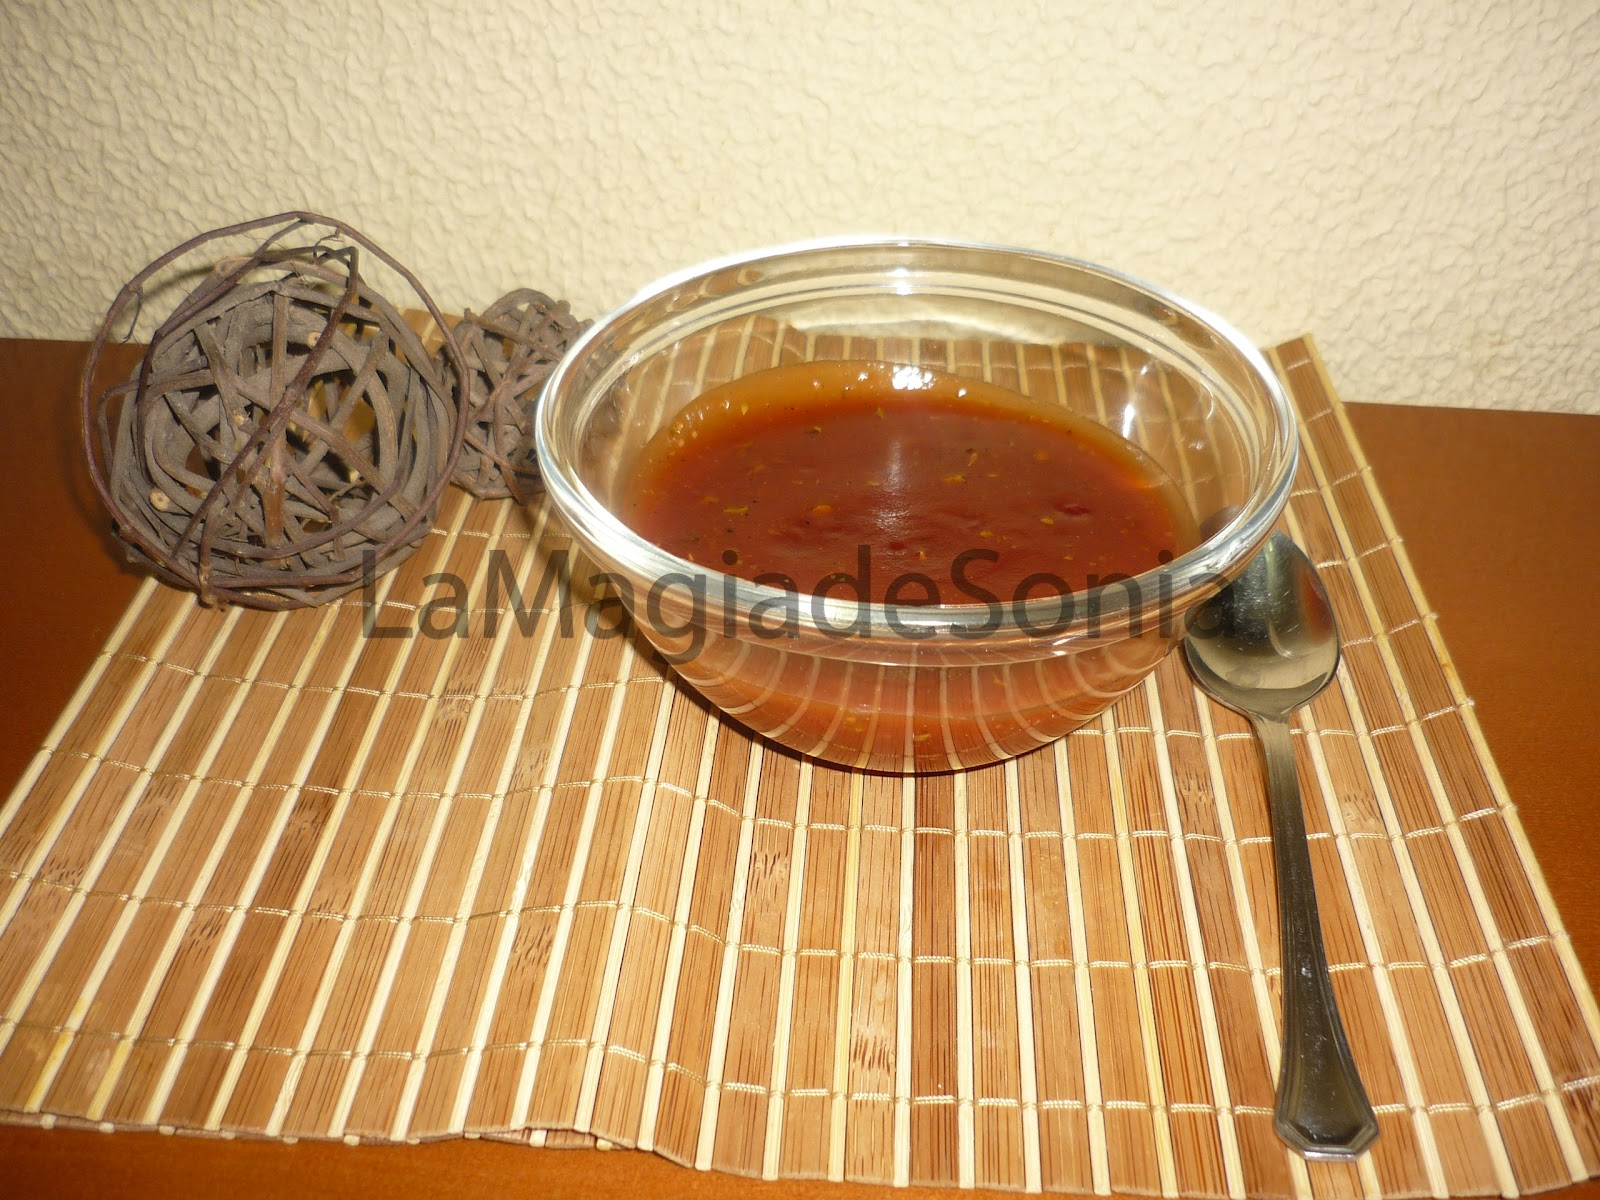 La magia de sonia salsa barbacoa casera for Salsa barbacoa ingredientes